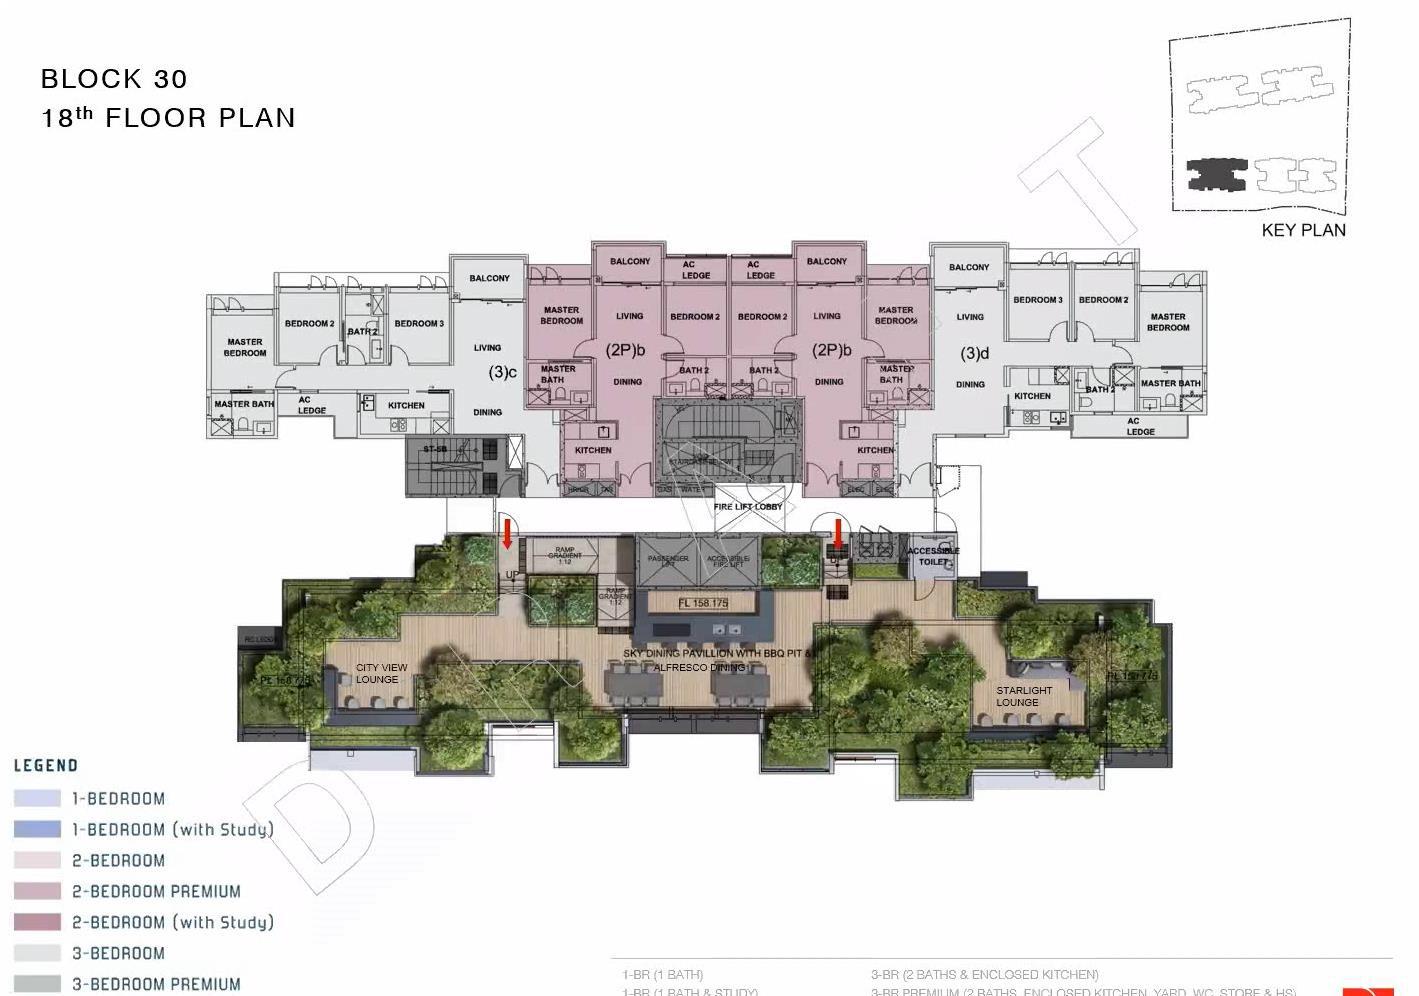 penrose-sims-site plan-Block30-18thfloor